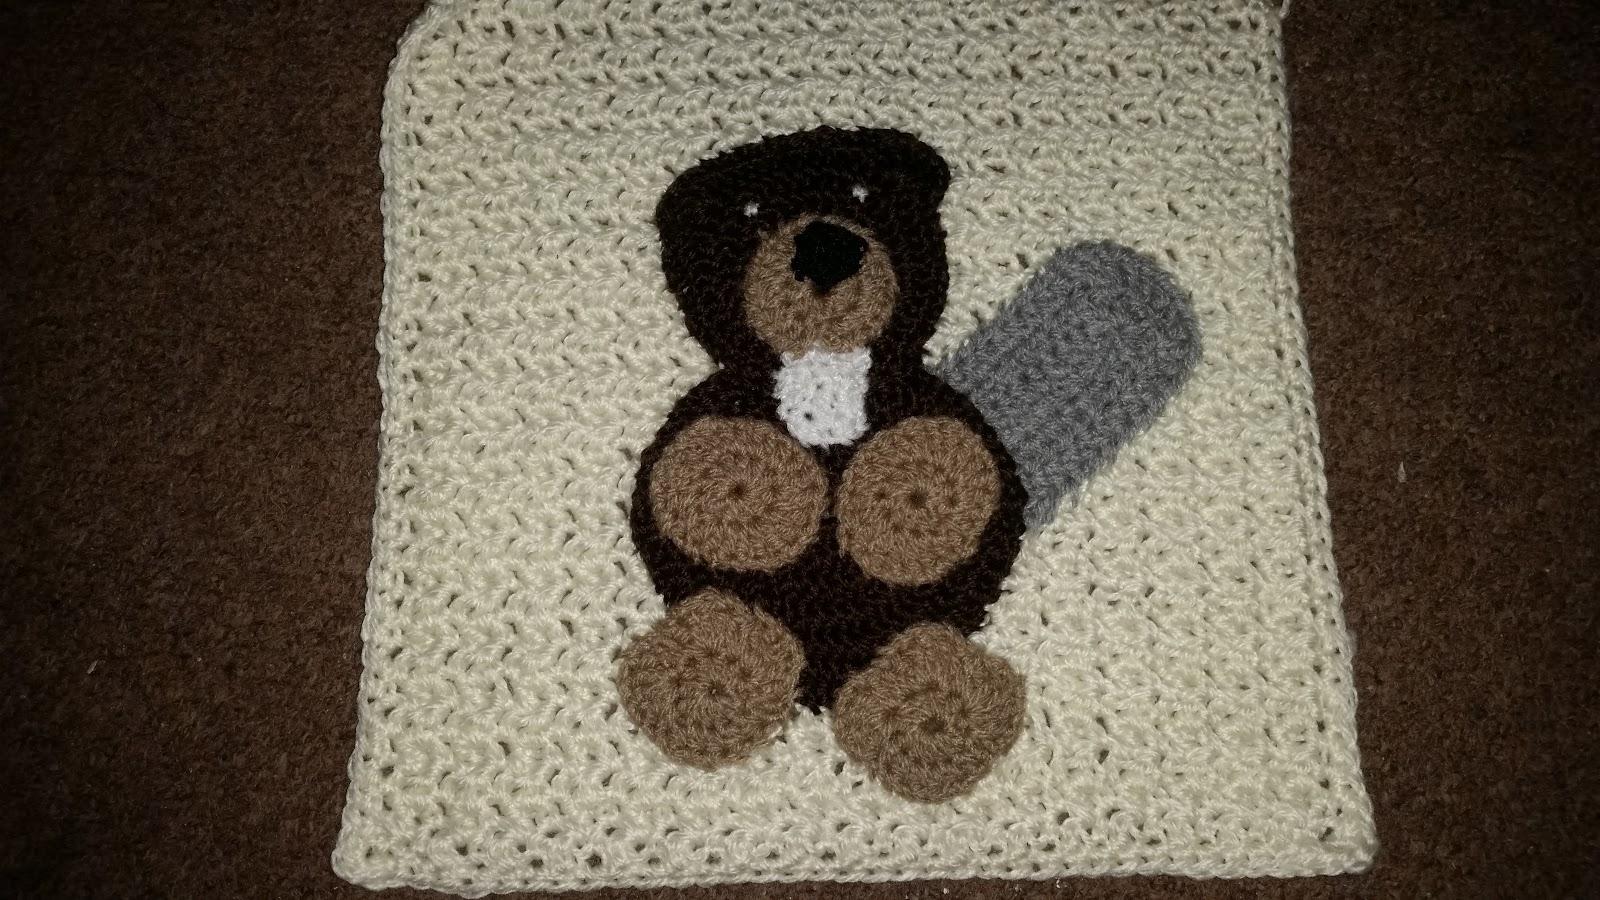 ... Lovely: WIP - Crochet - Woodland Blanket No.2 - Beaver Applique